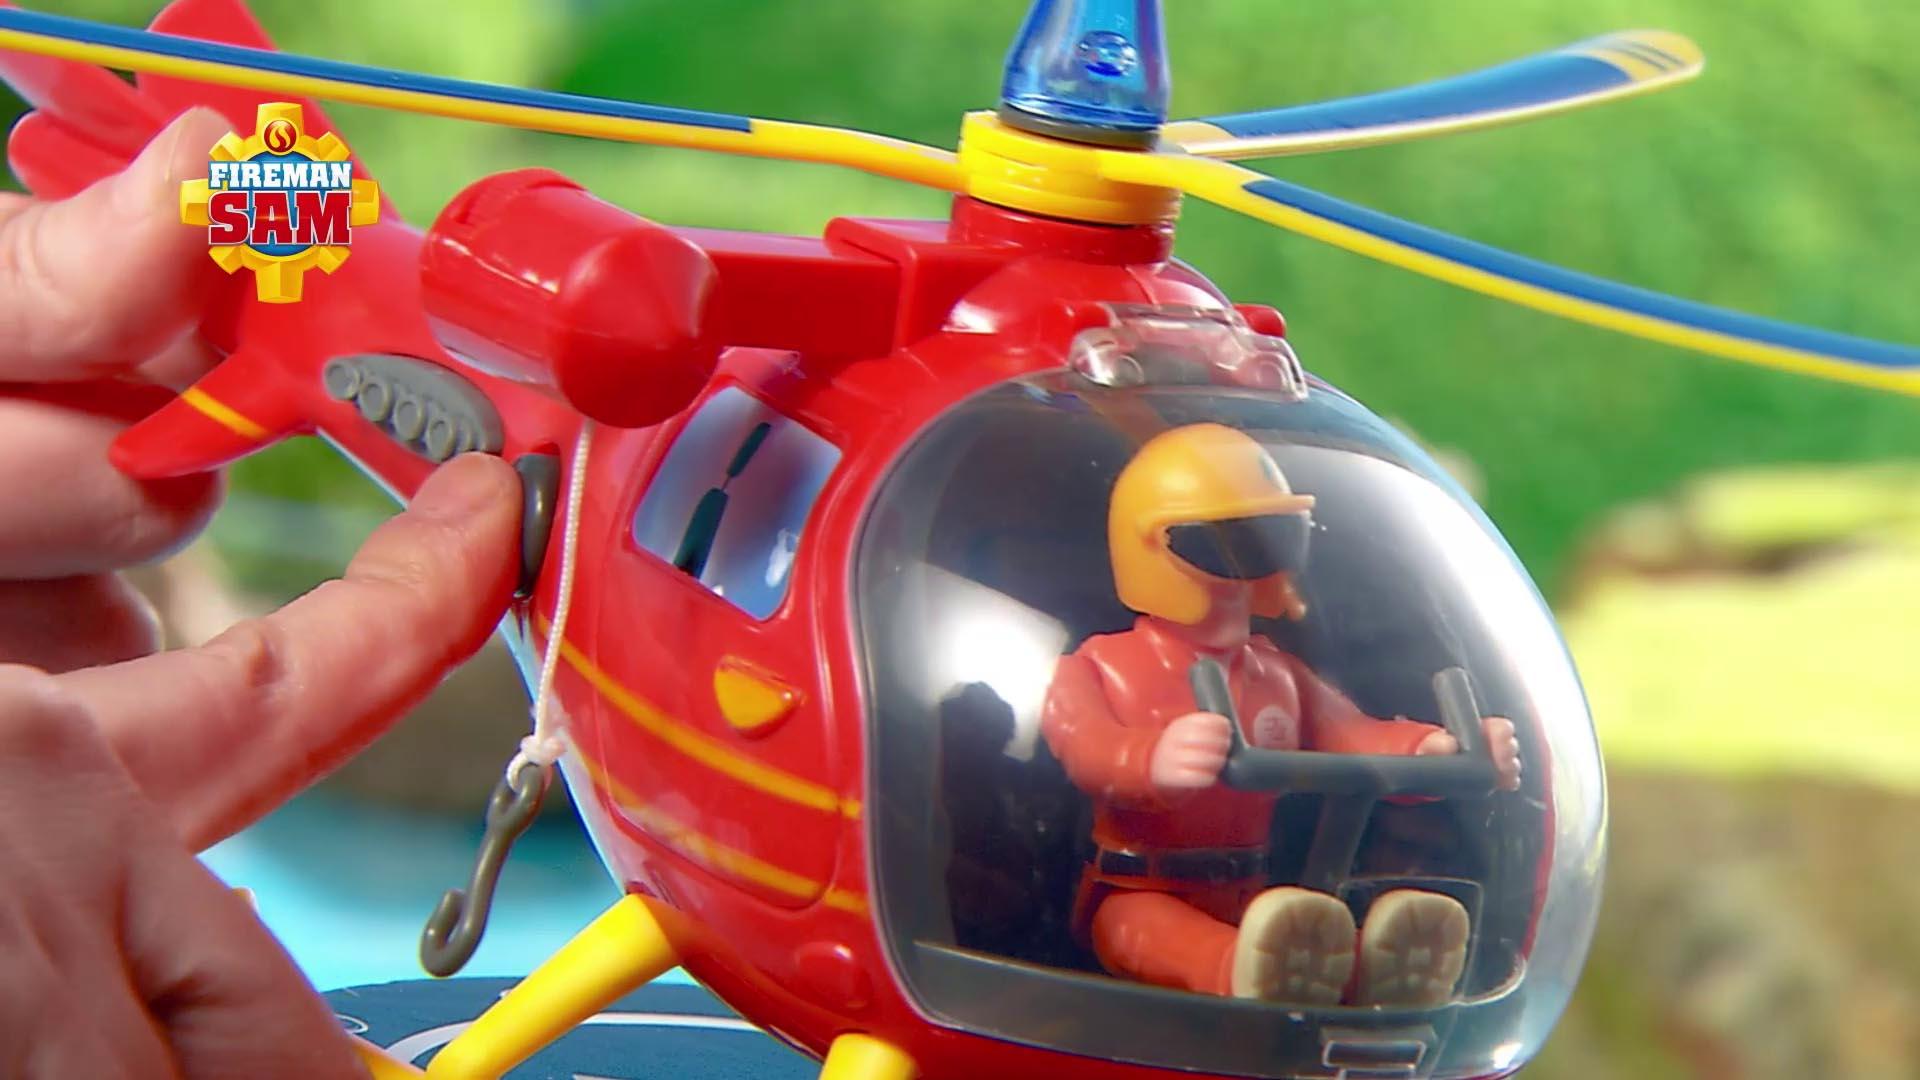 Feuerwehrmann Sam Fahrzeuge Simba Toys Fireman Sam Simba Toys